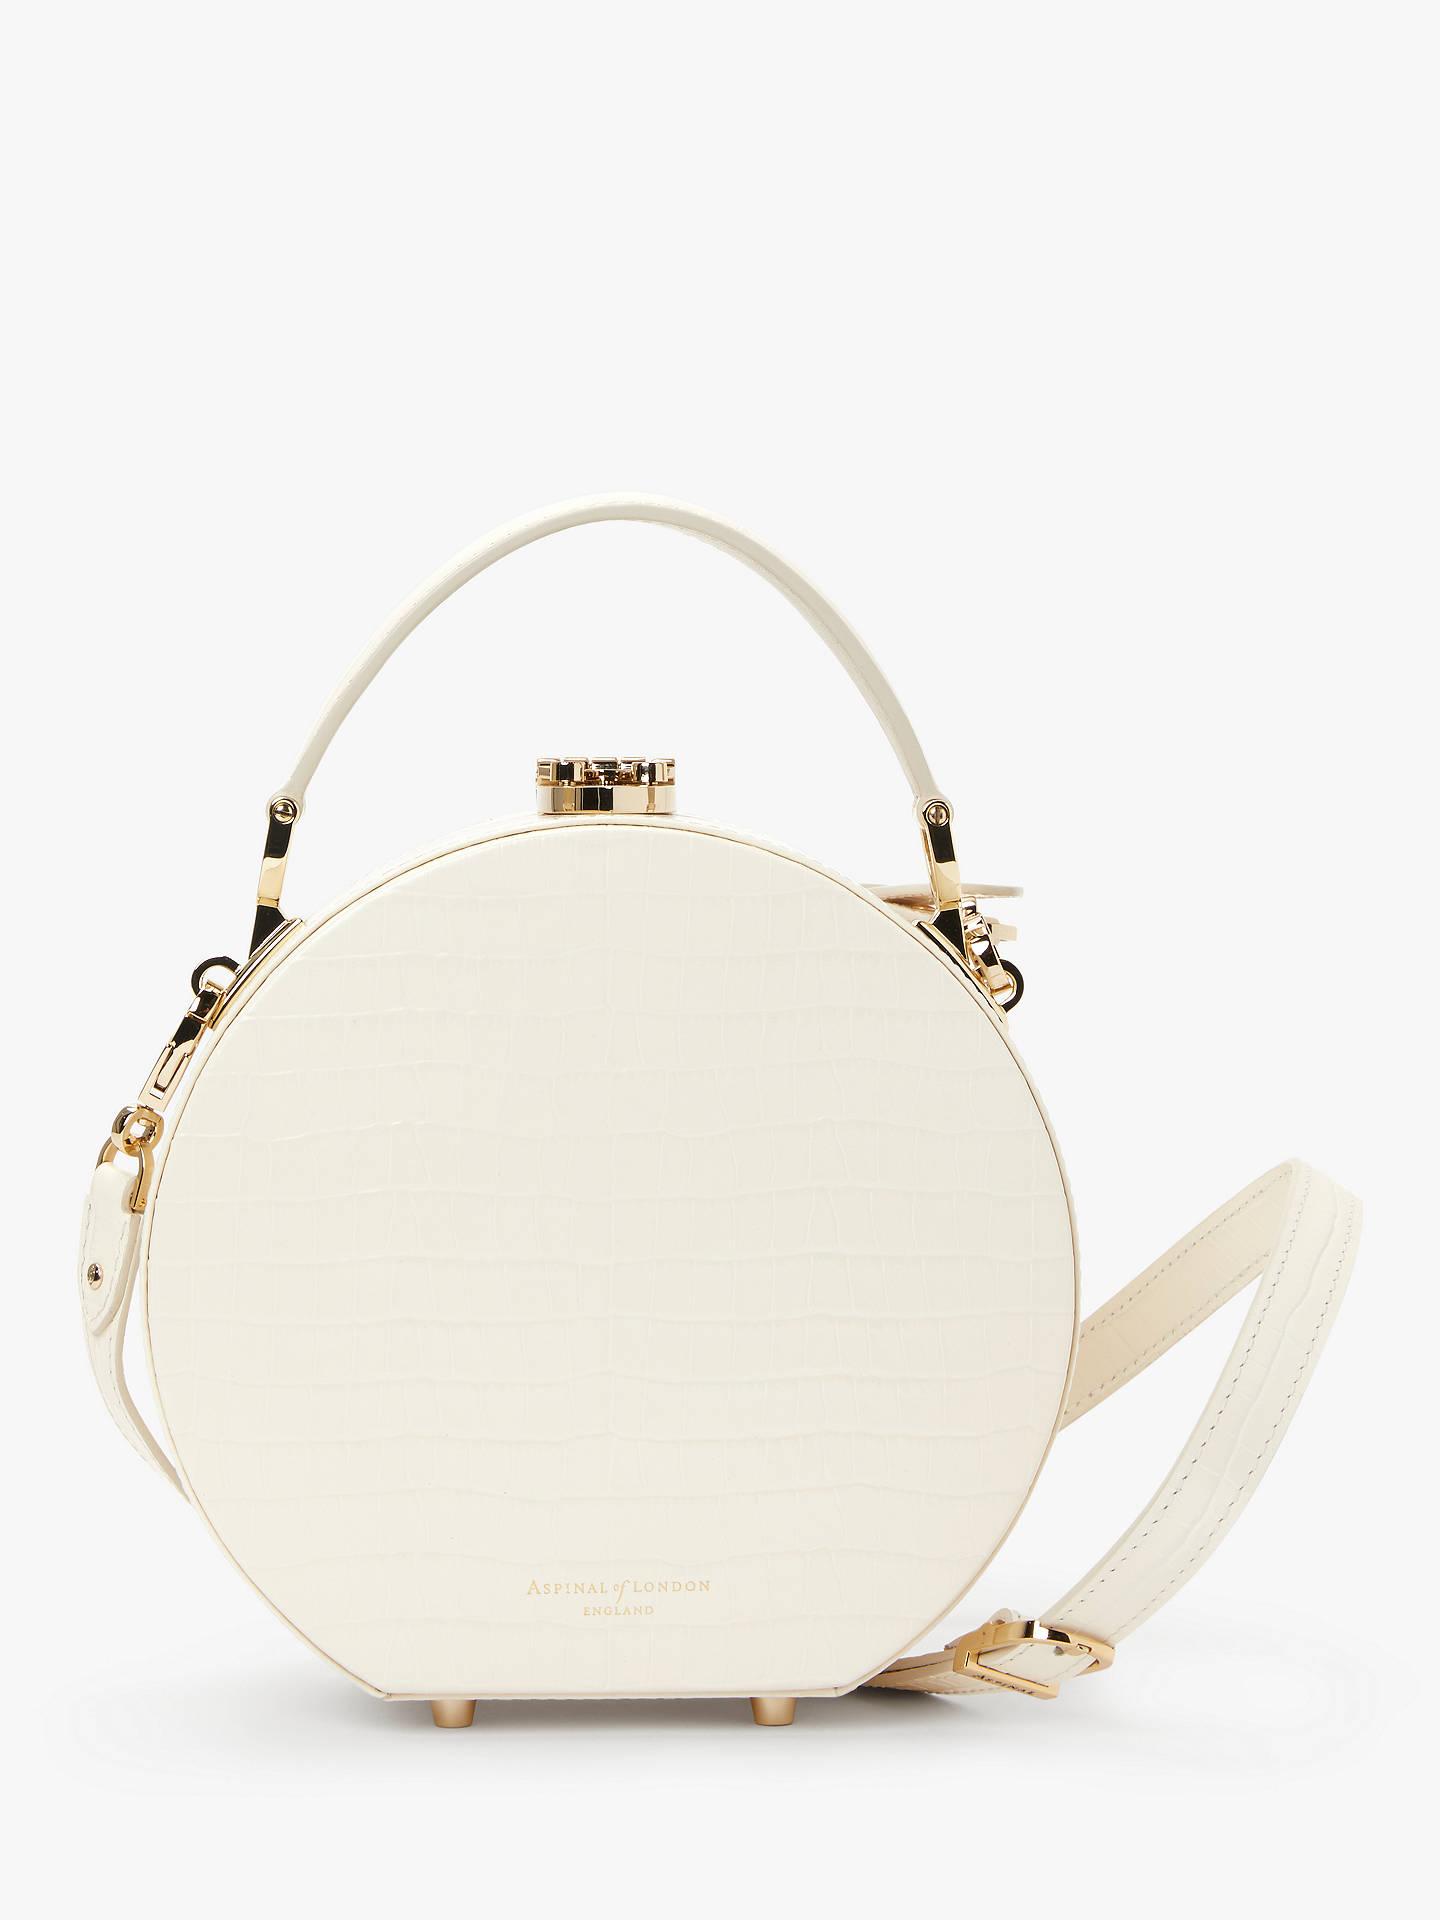 153c3838e4 Aspinal of London Leather Mini Hat Box Grab Bag, Ivory Croc